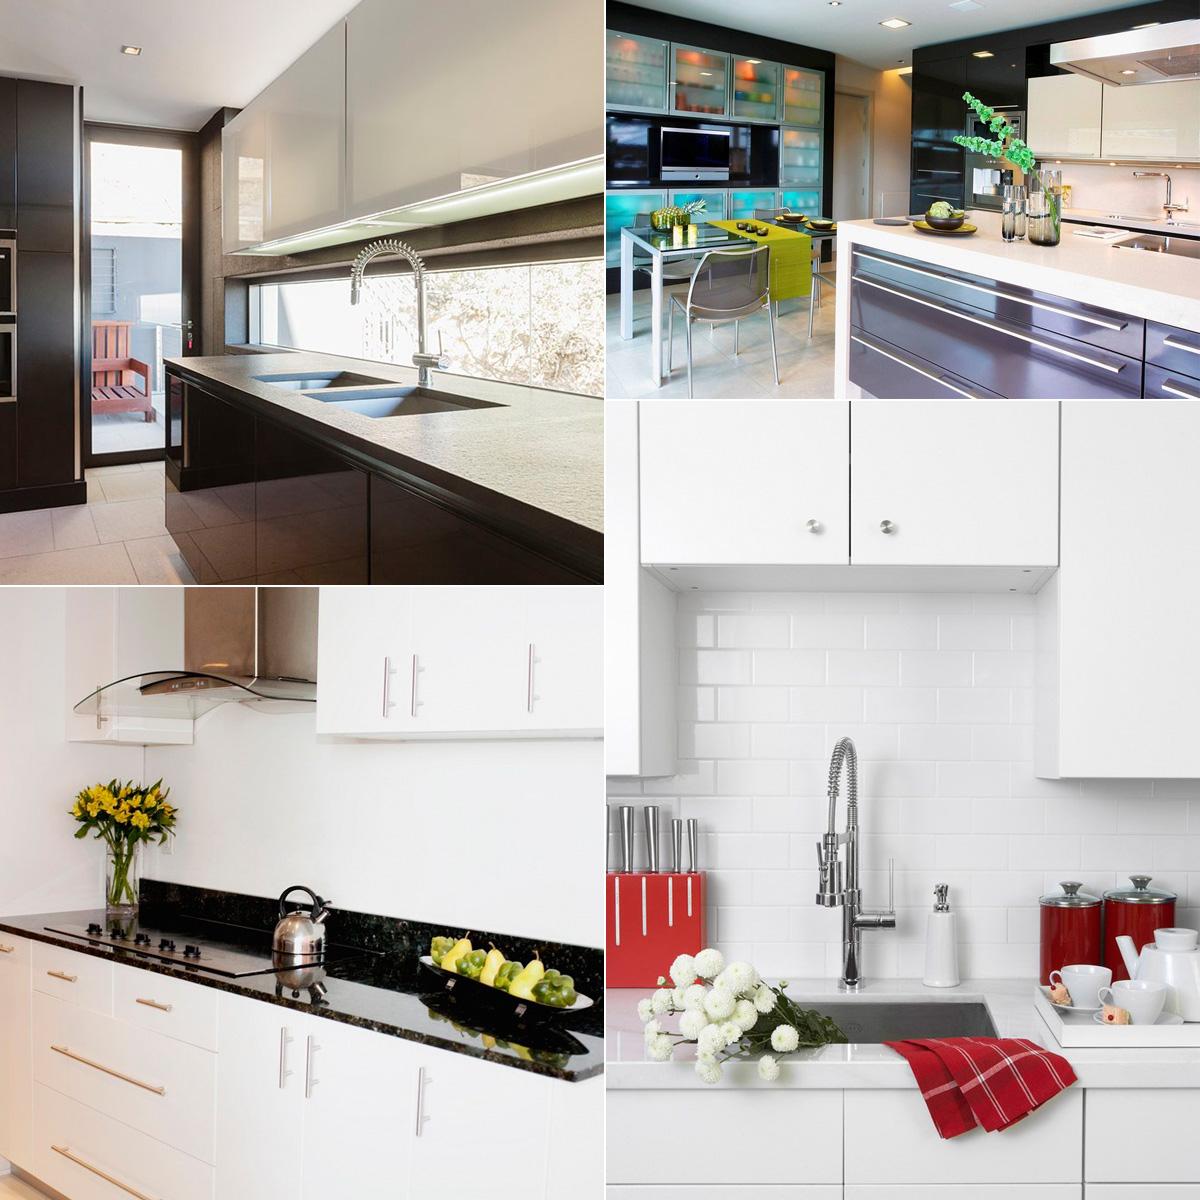 10m wei m belfolie bad k che deko selbstklebende folie plotterfolie klebefolie ebay. Black Bedroom Furniture Sets. Home Design Ideas